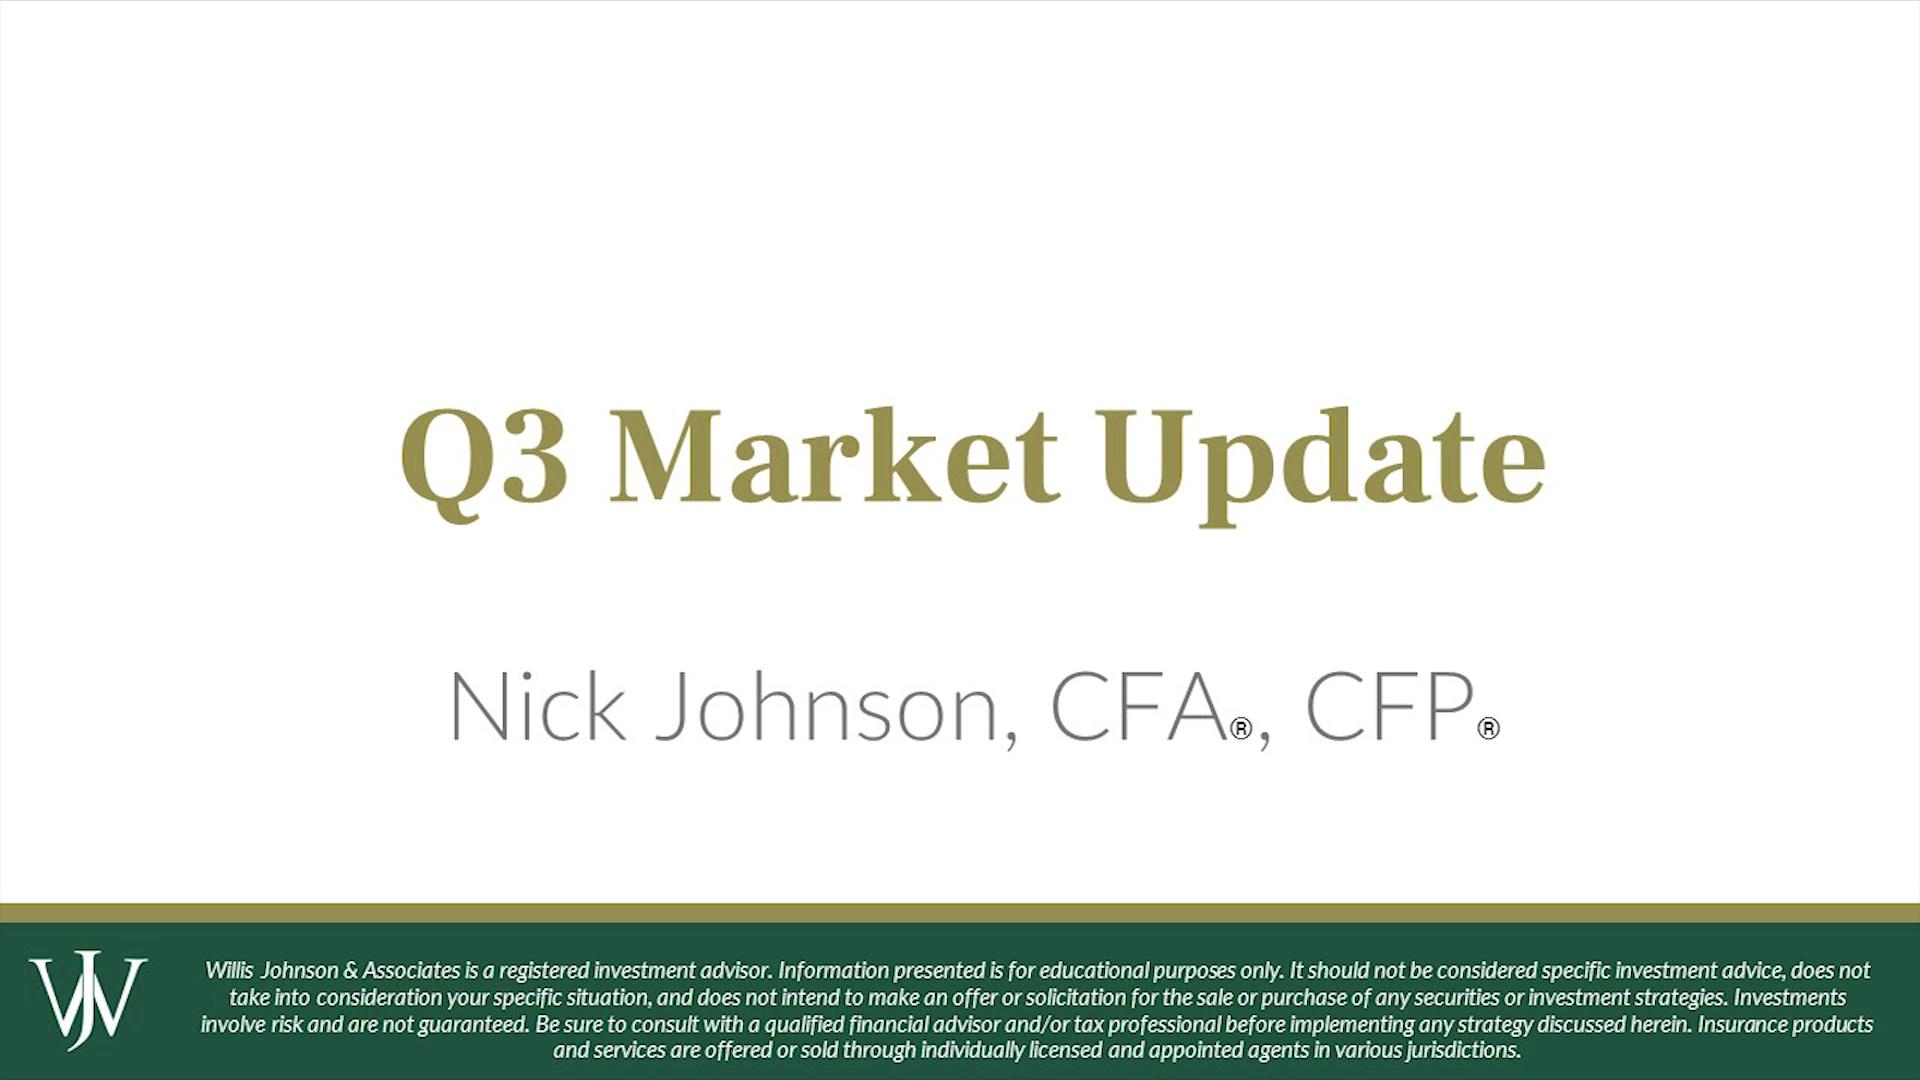 Q3 Stock Market Update- Teaser